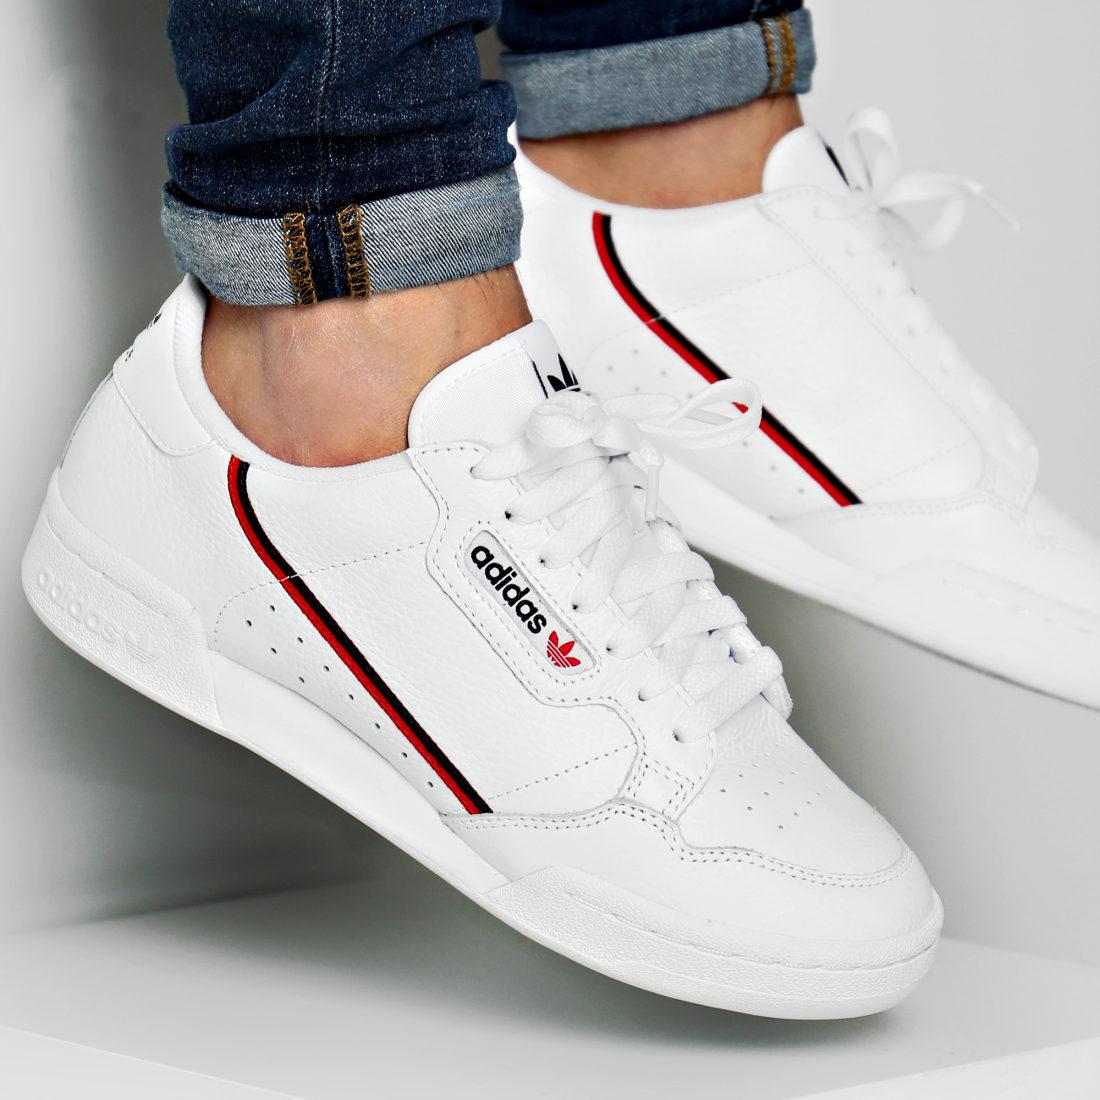 adidas - Baskets Continental 80 G27706 Footwear White Scarlet Core ...